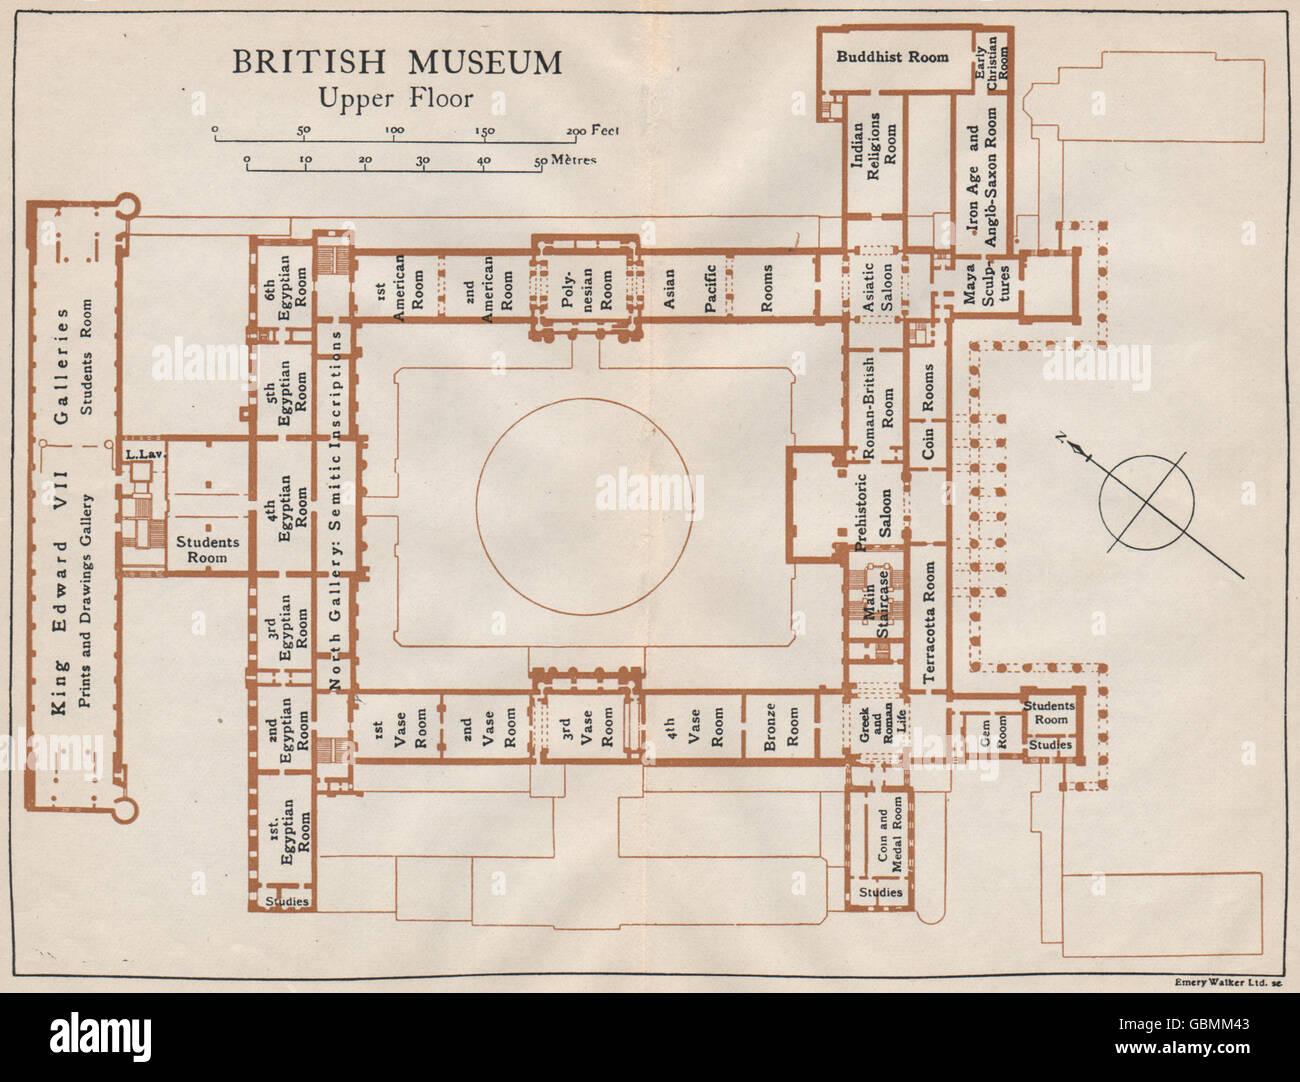 British Museum Upper Floor Vintage Map Plan London 1927 Stock